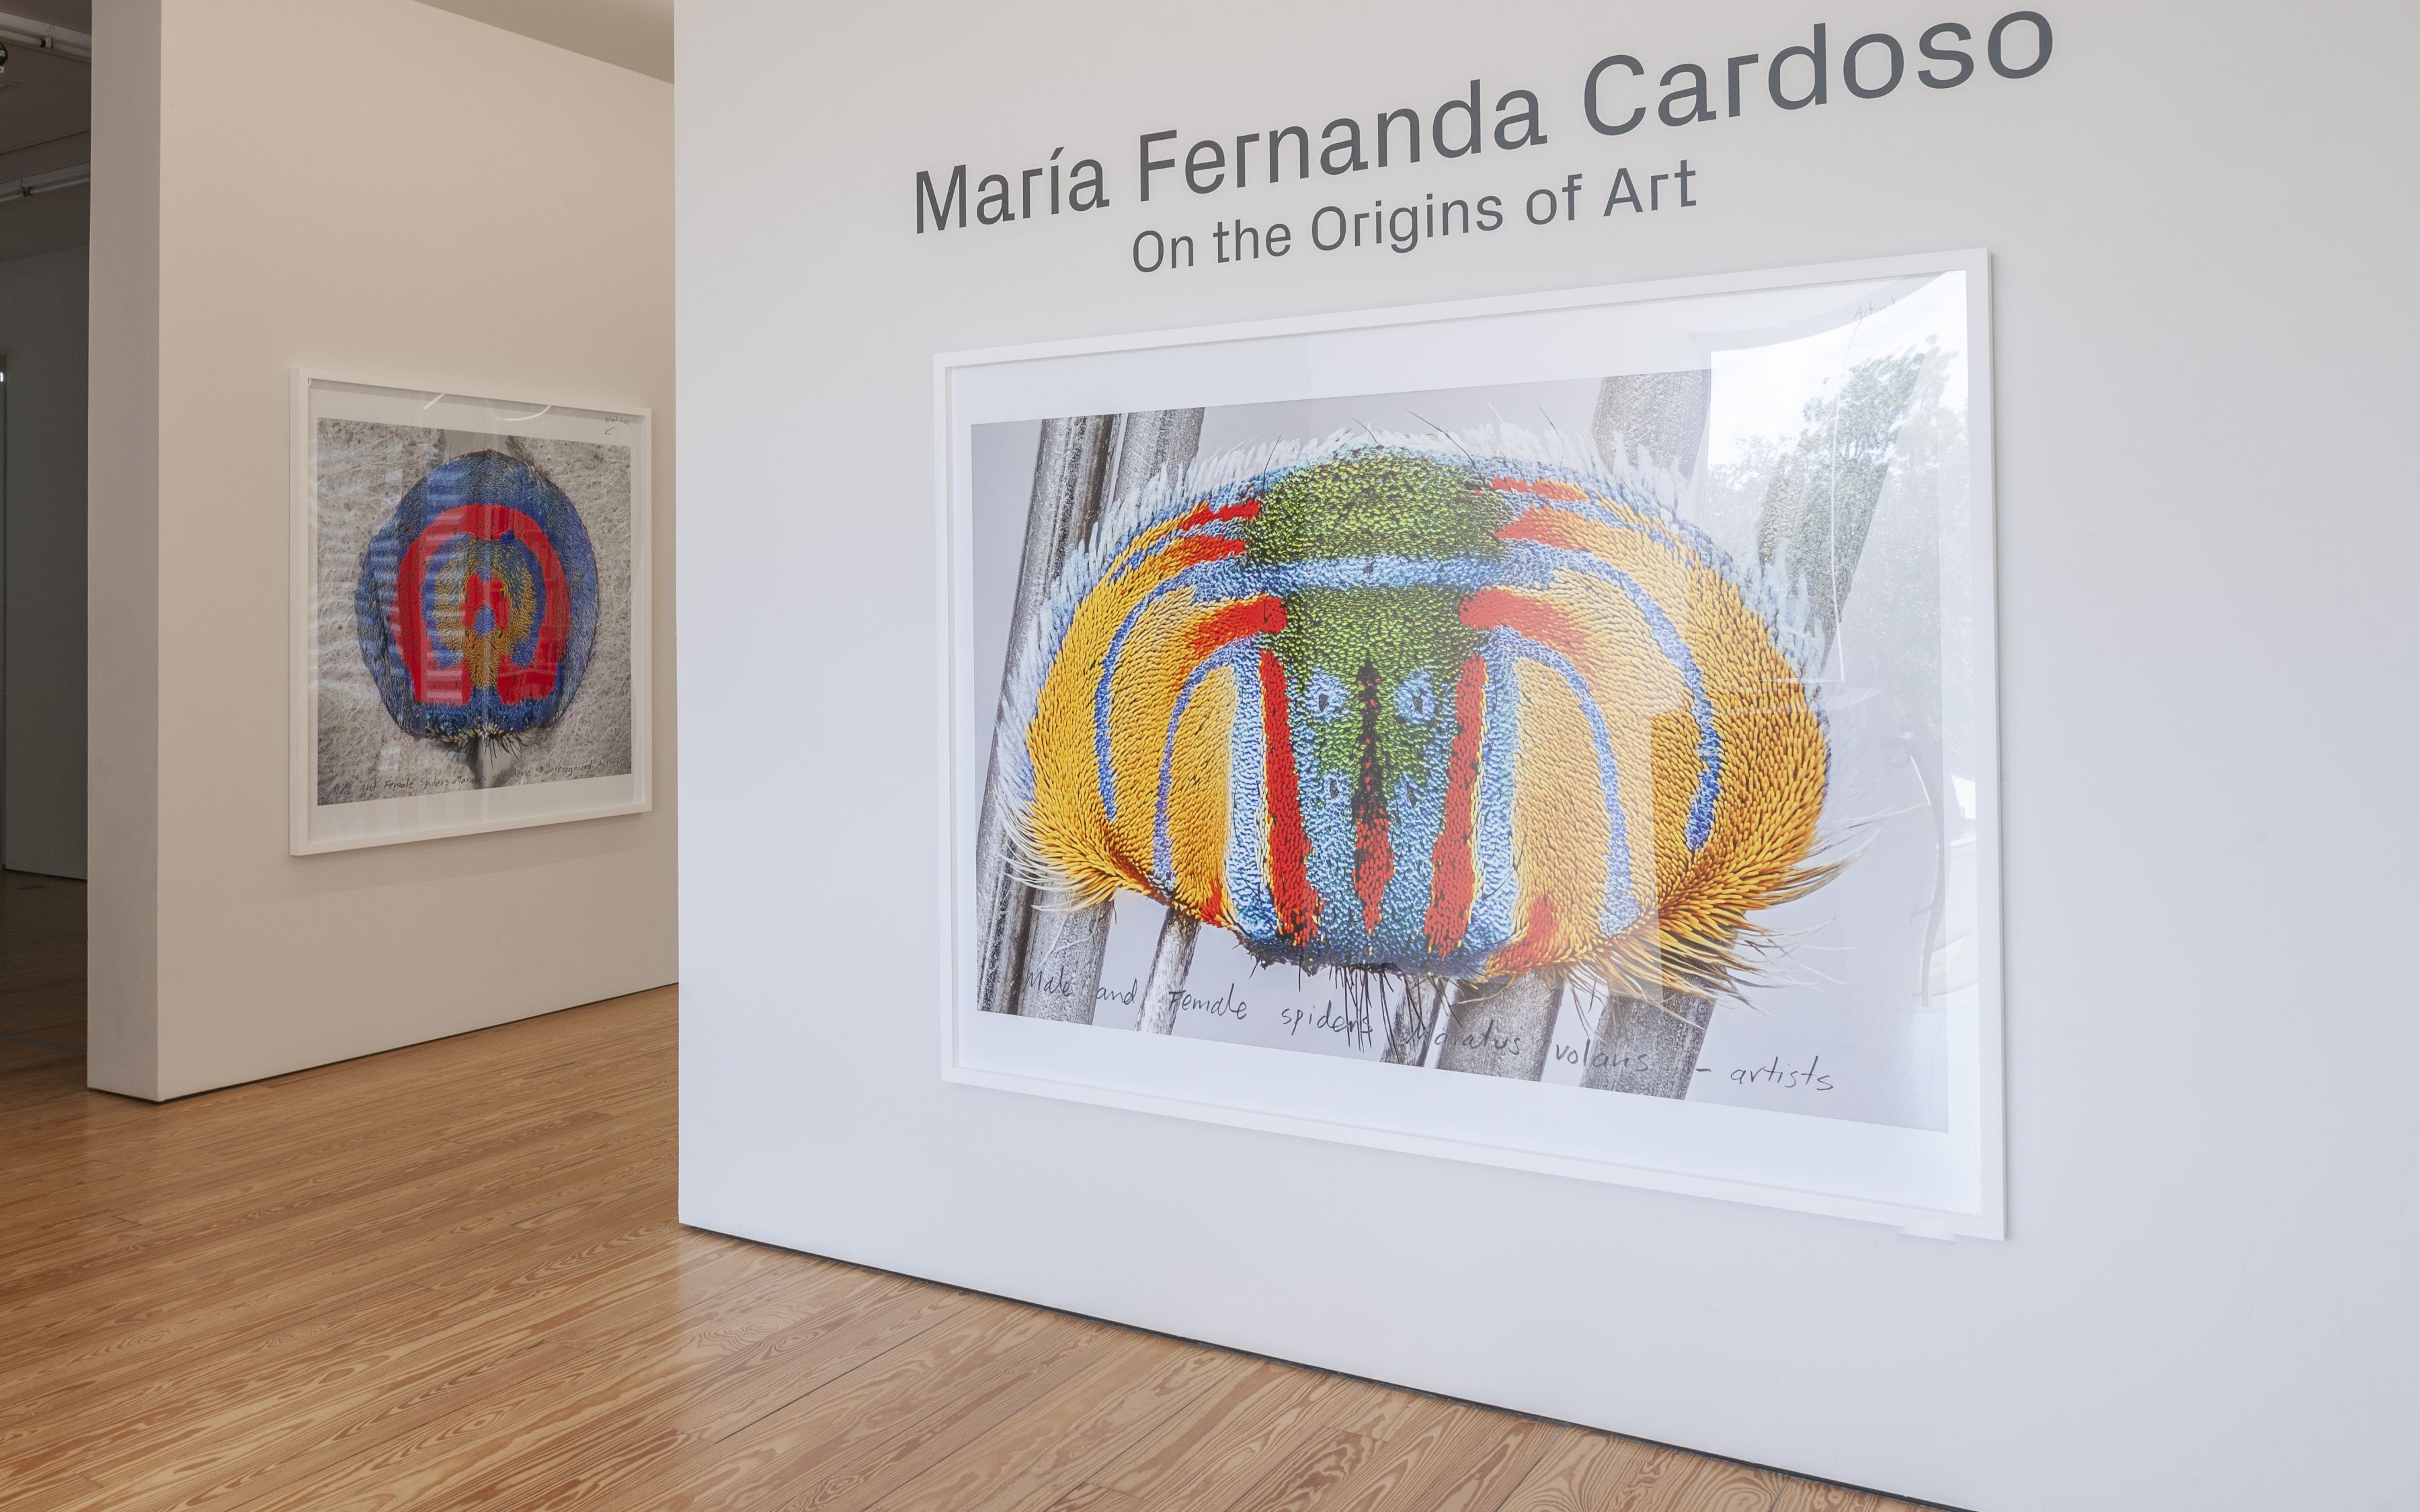 Maria Fernanda Cardoso: On the Origins of Art.